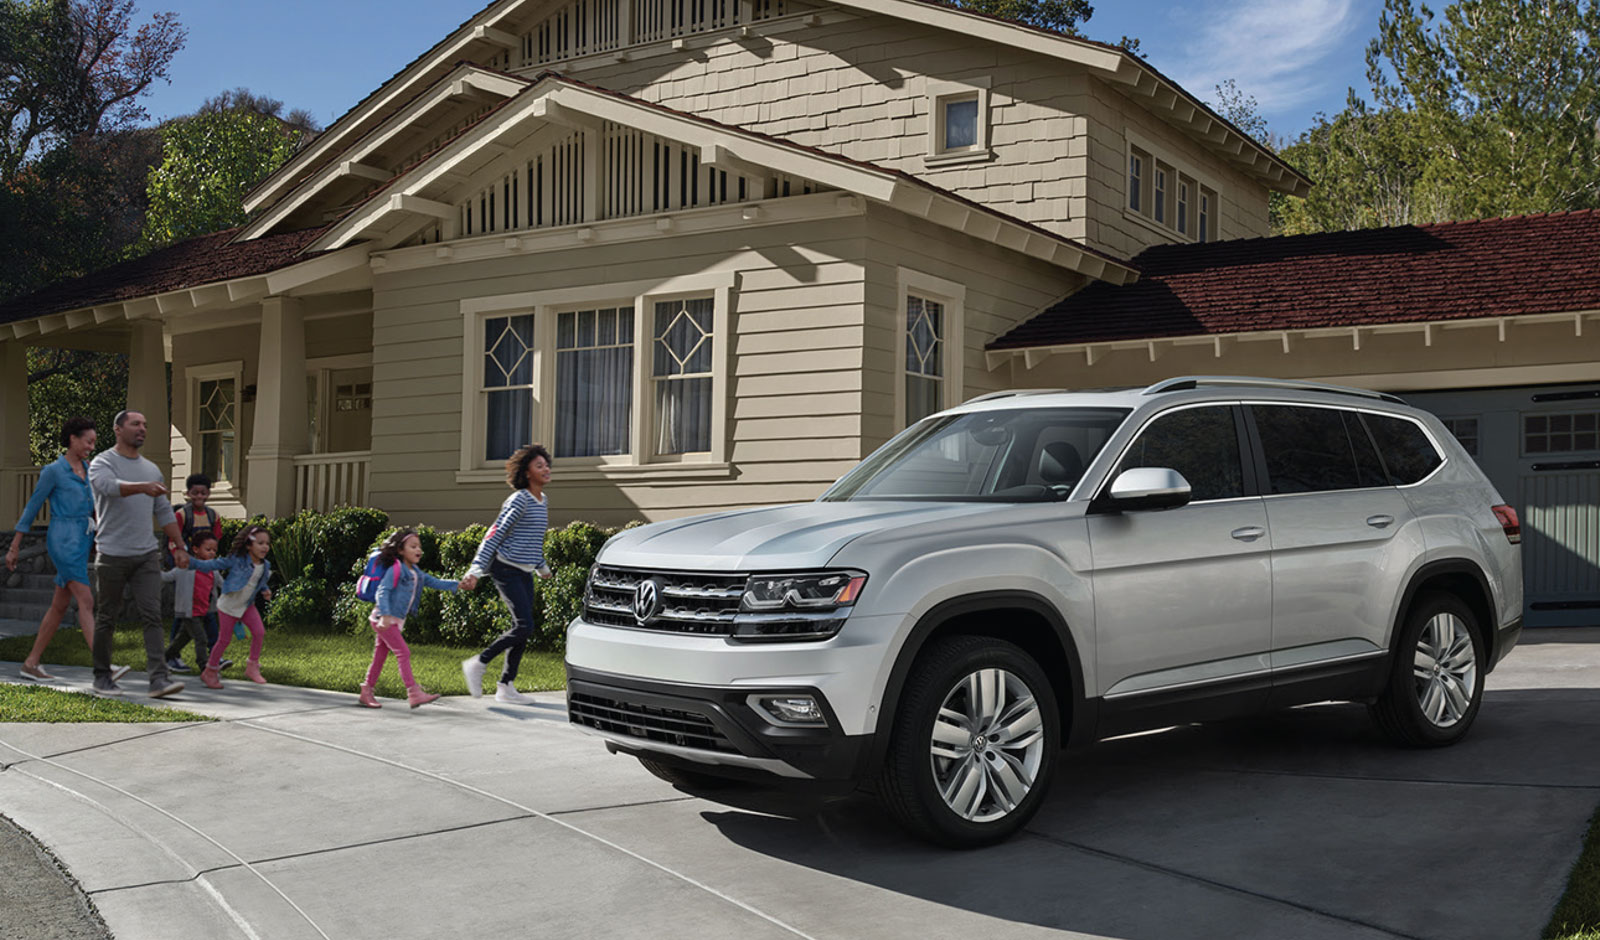 Volkswagen U S Military Car Buying Program Military Autosource Mas